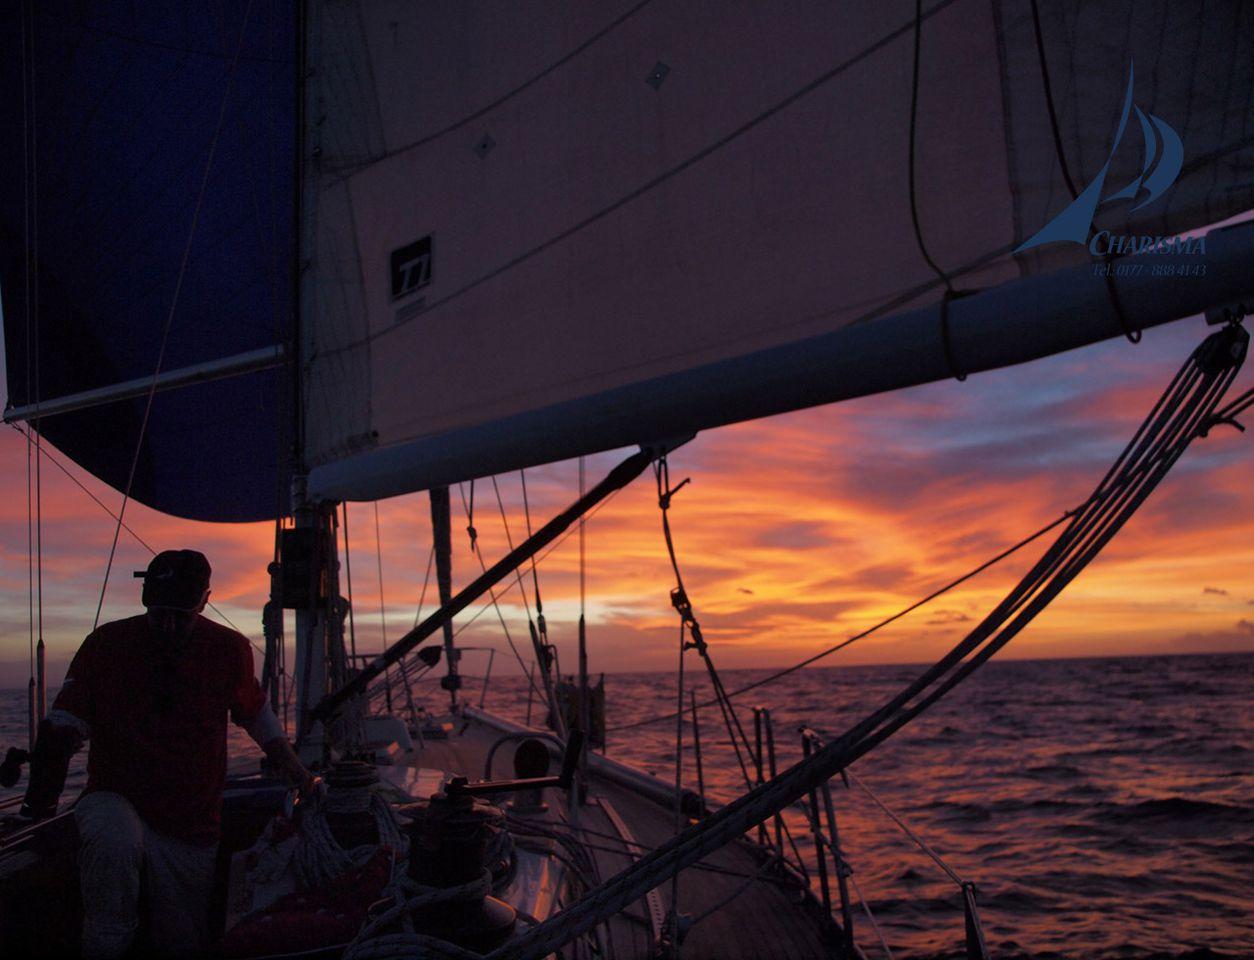 Segeln sonnenuntergang  Segeltörn Virgin Islands & Bahamas segeln mit charisma4sea